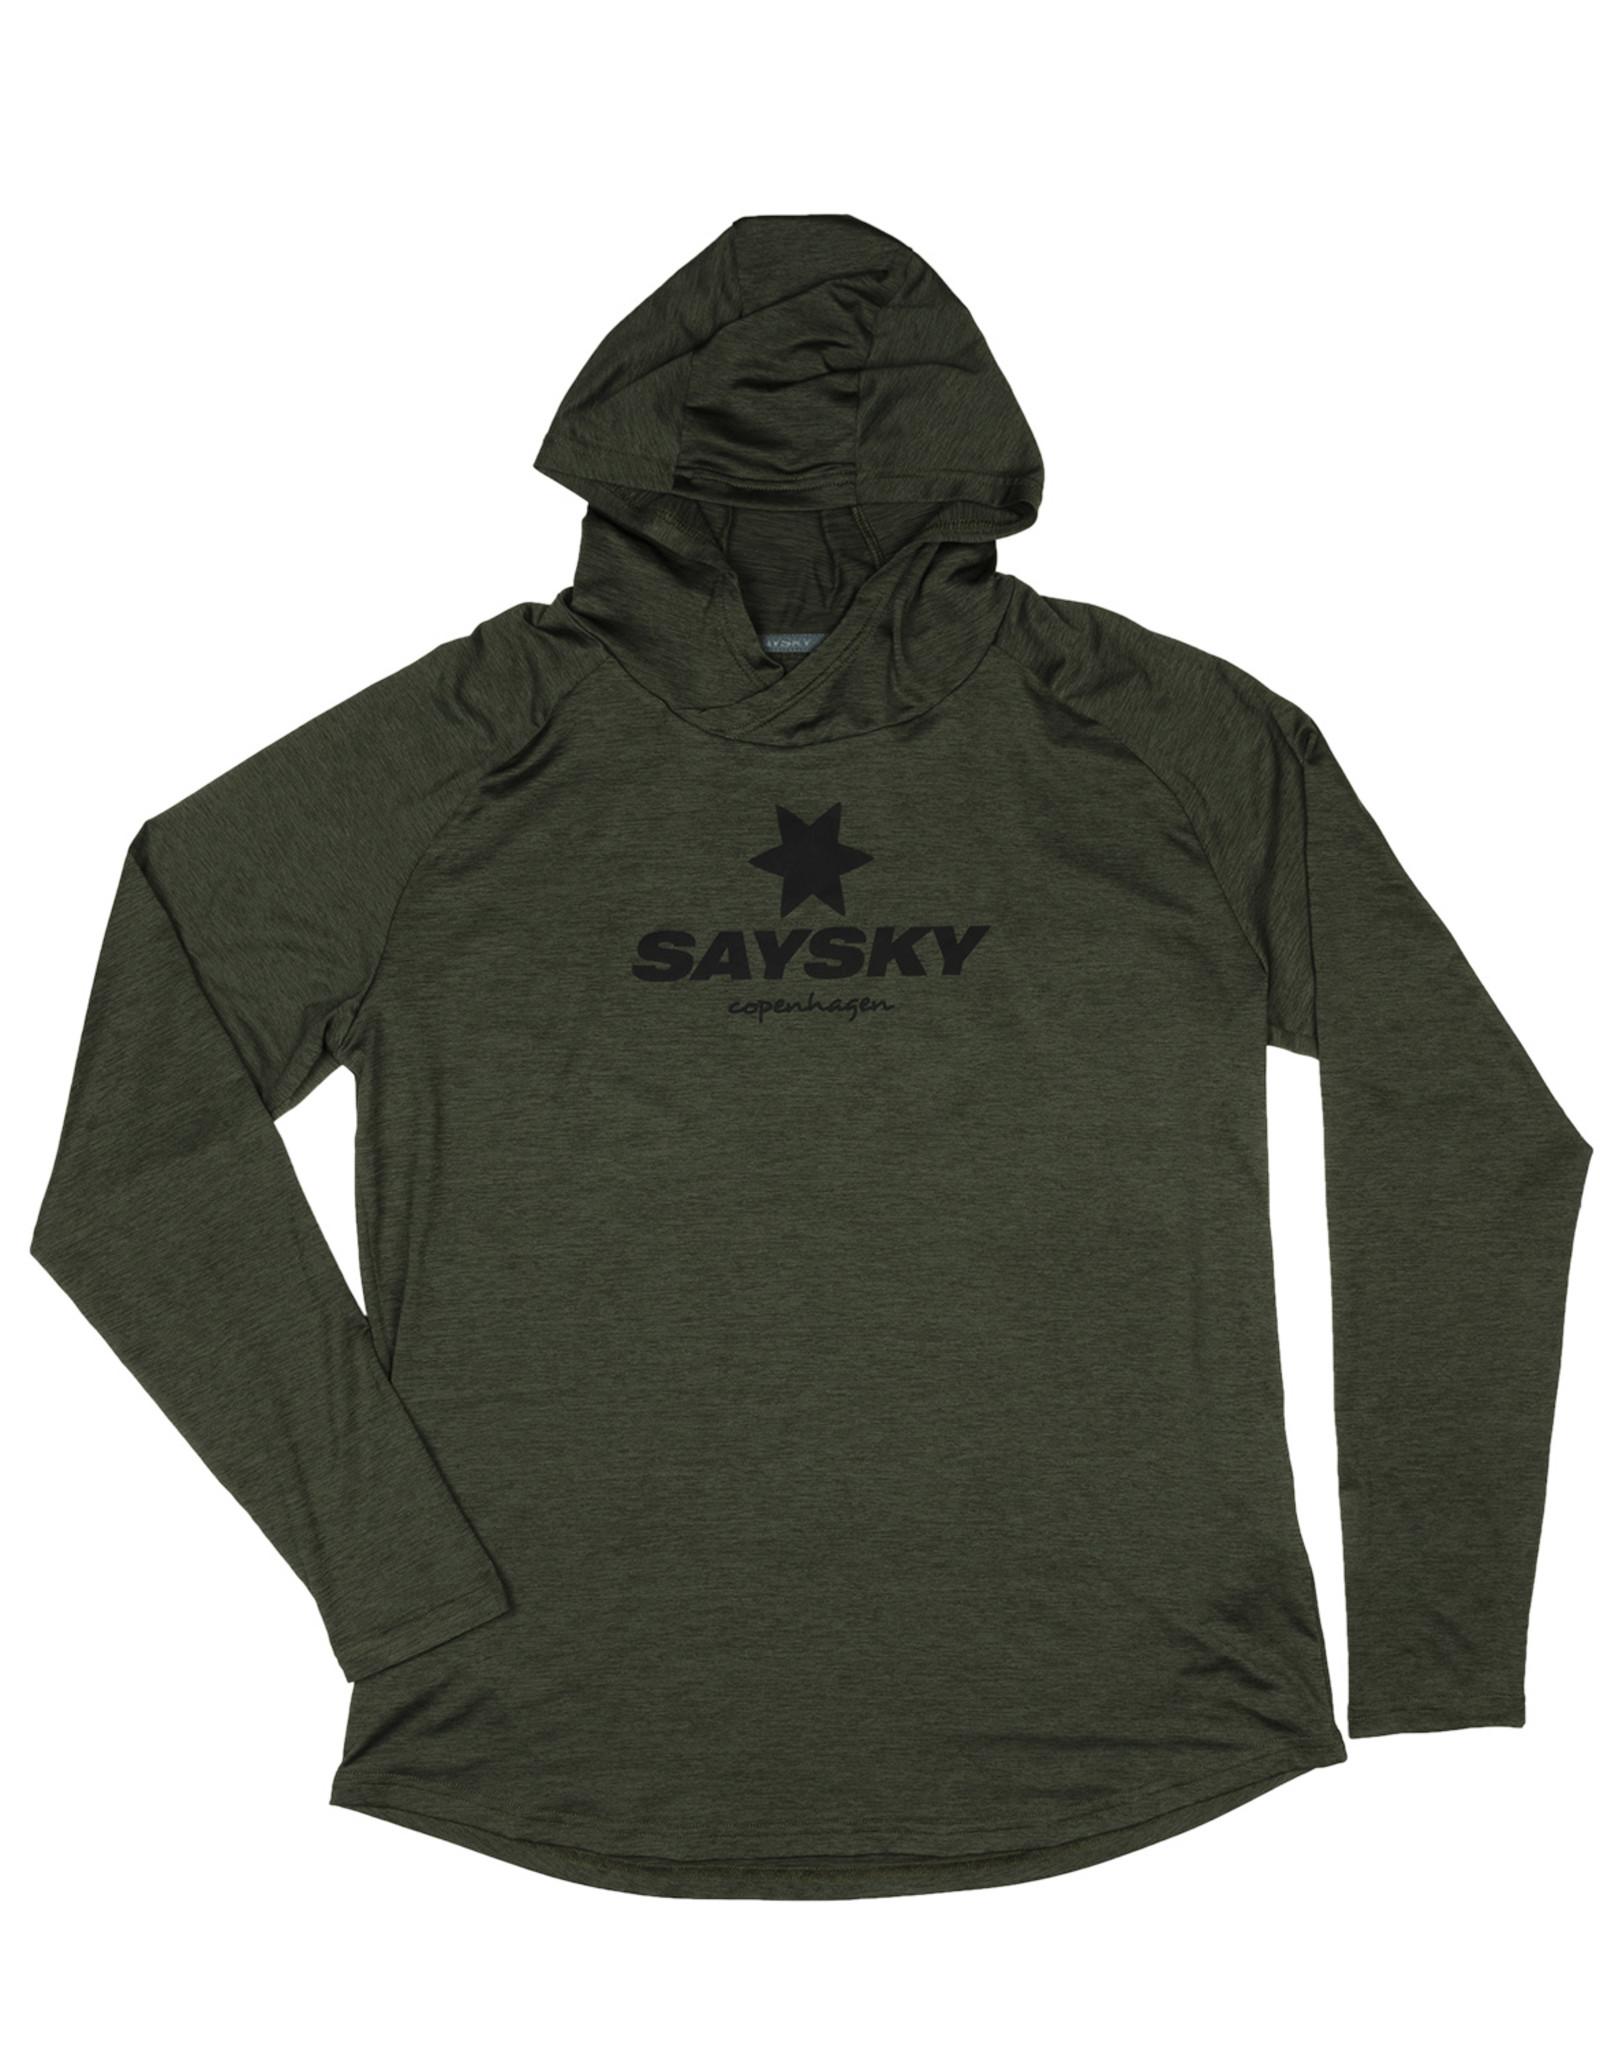 Saysky Hooded Pace LS unisex (ref EMRLS08)